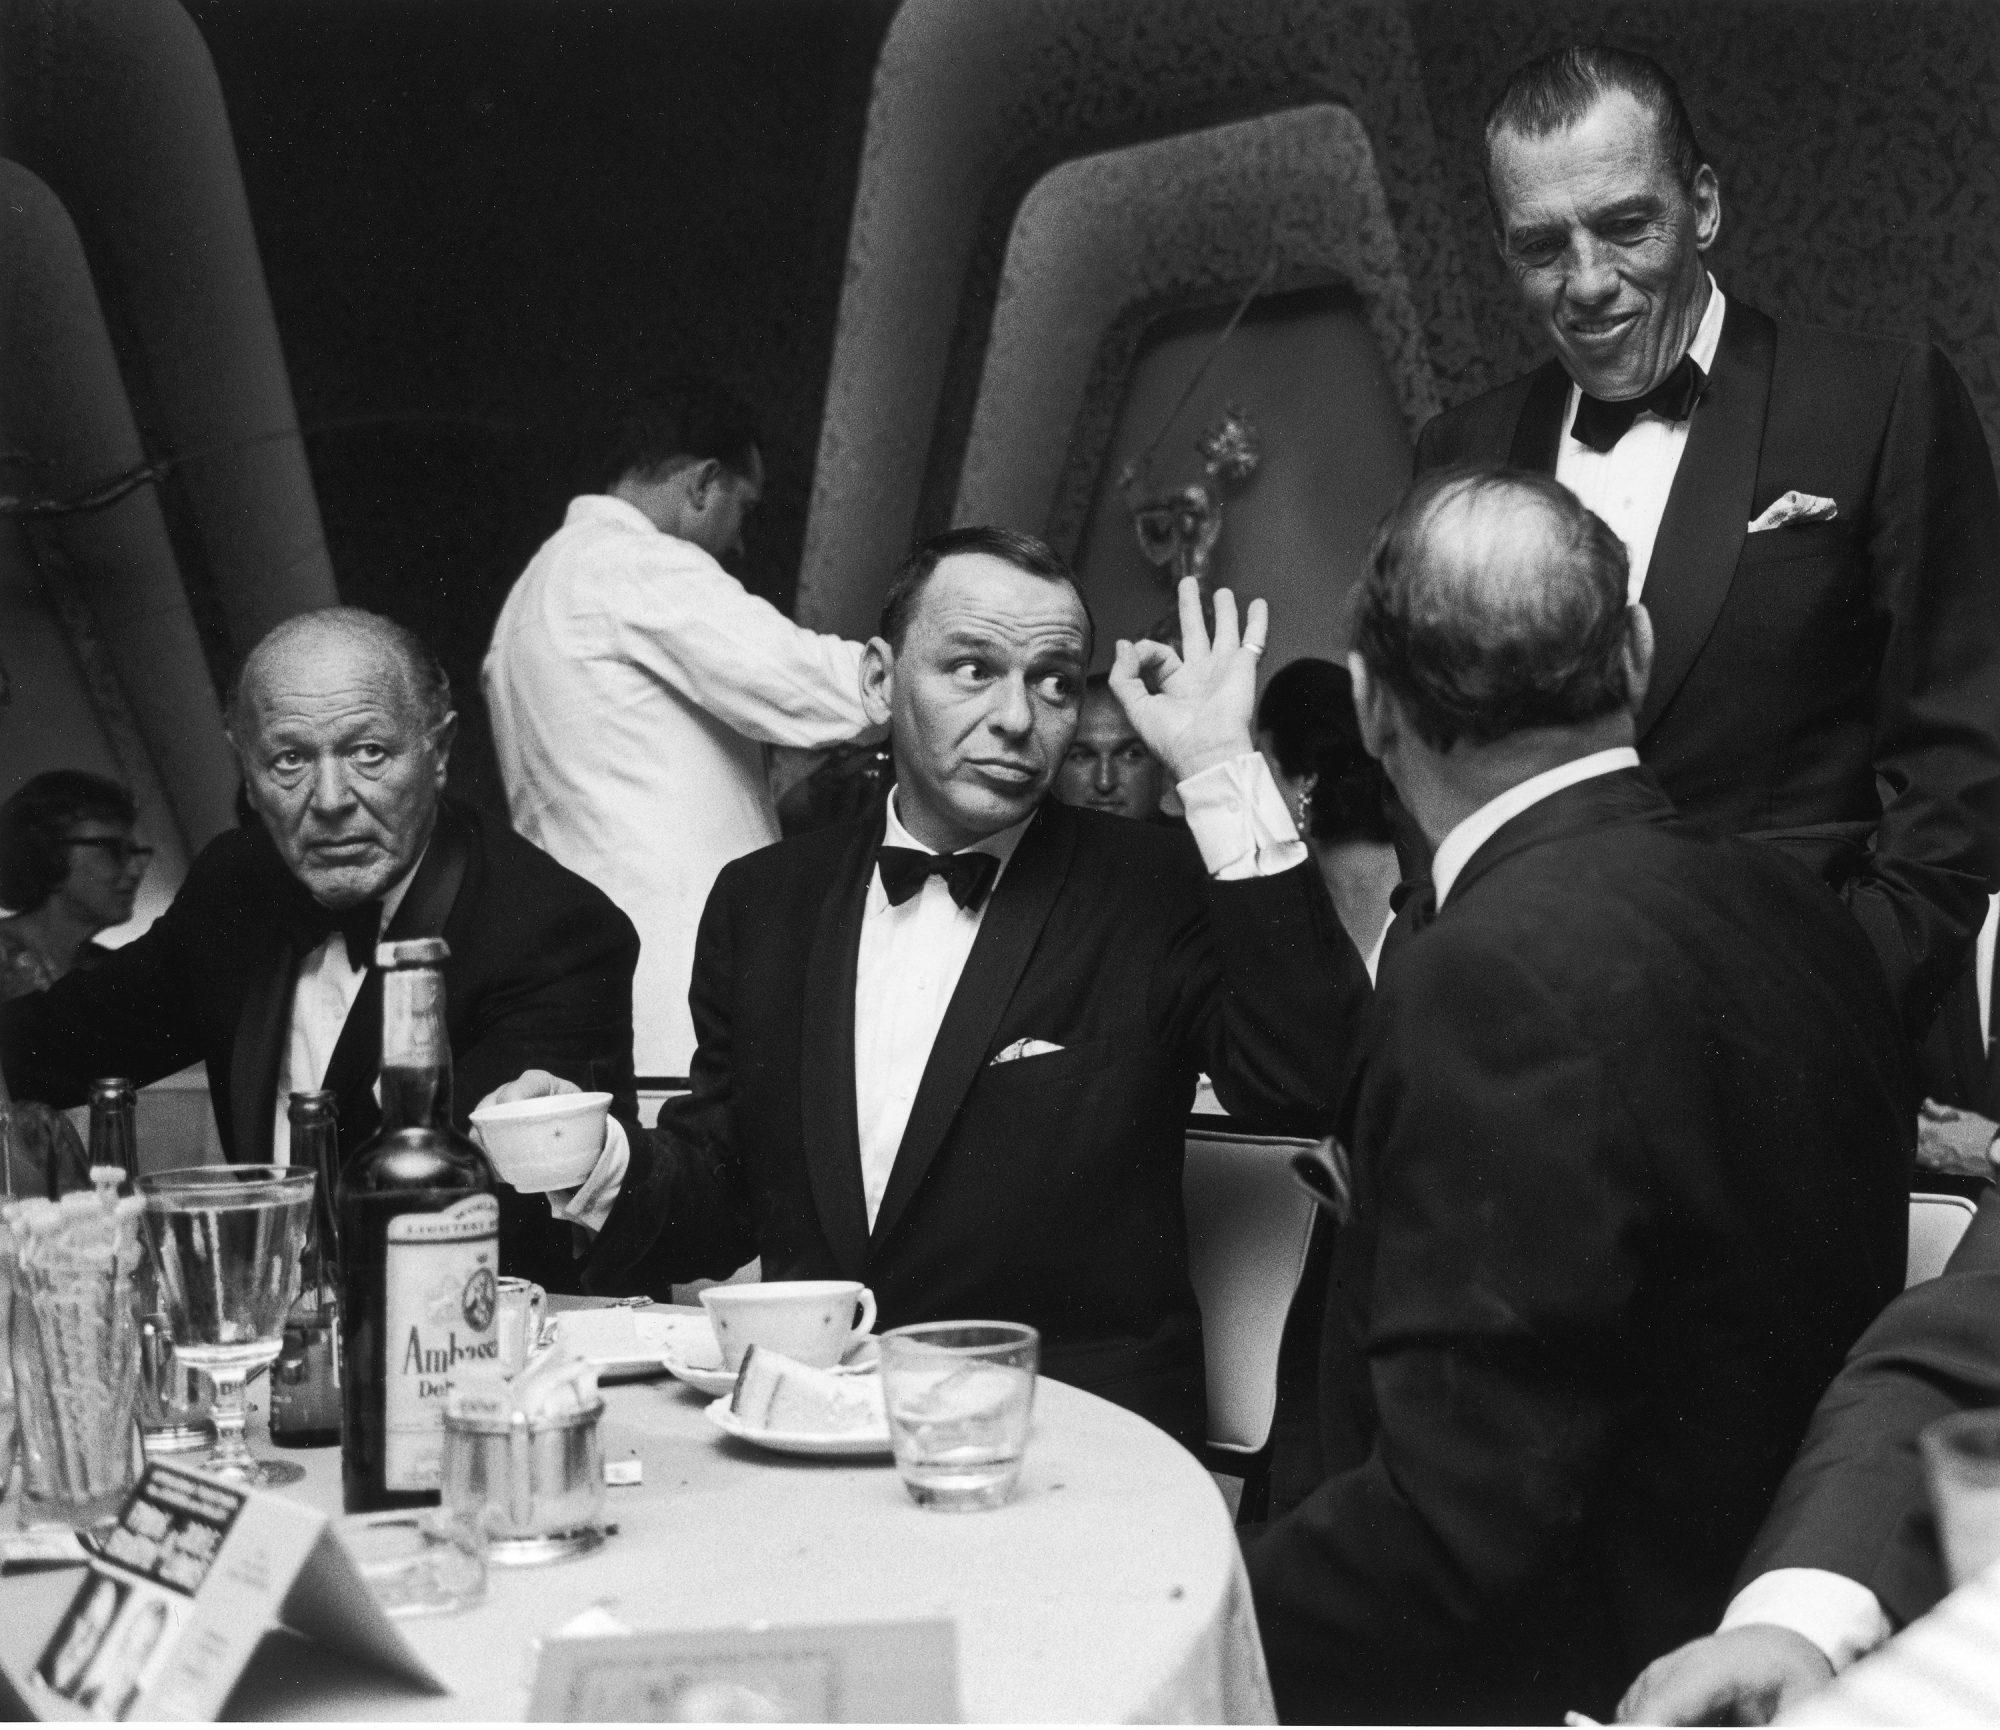 Dominis Frank Sinatra.jpg